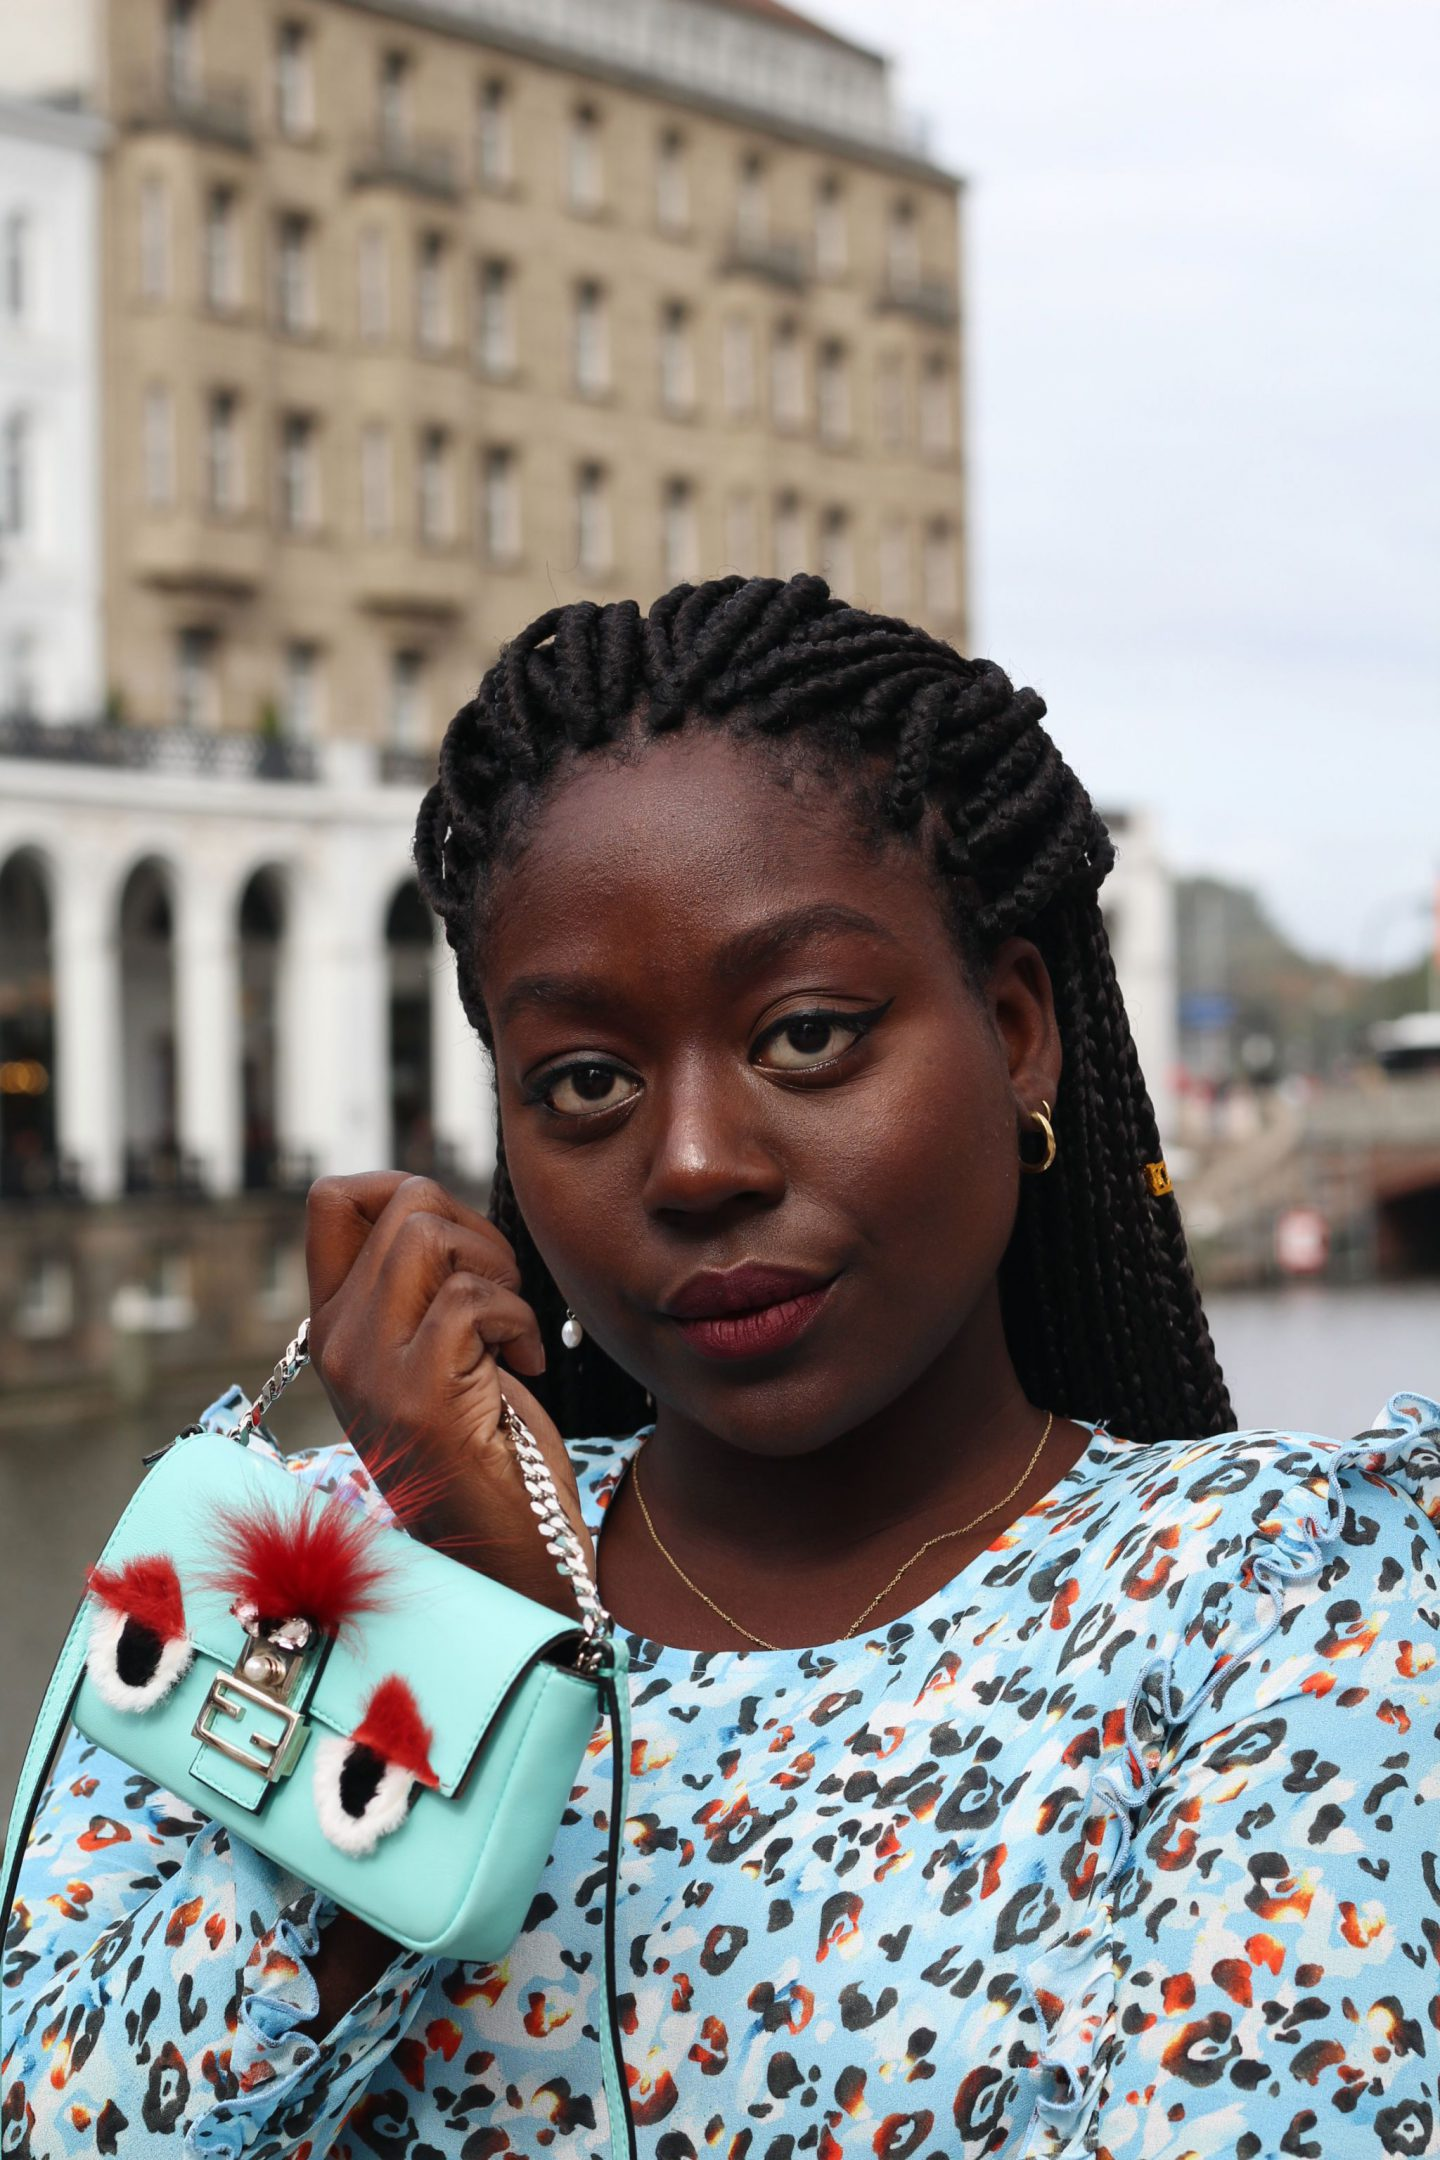 Lala_Berlin_Streetstyle_Lois_Opoku_Fashion_Blogger_Fendi_Monster_lisforlois_1